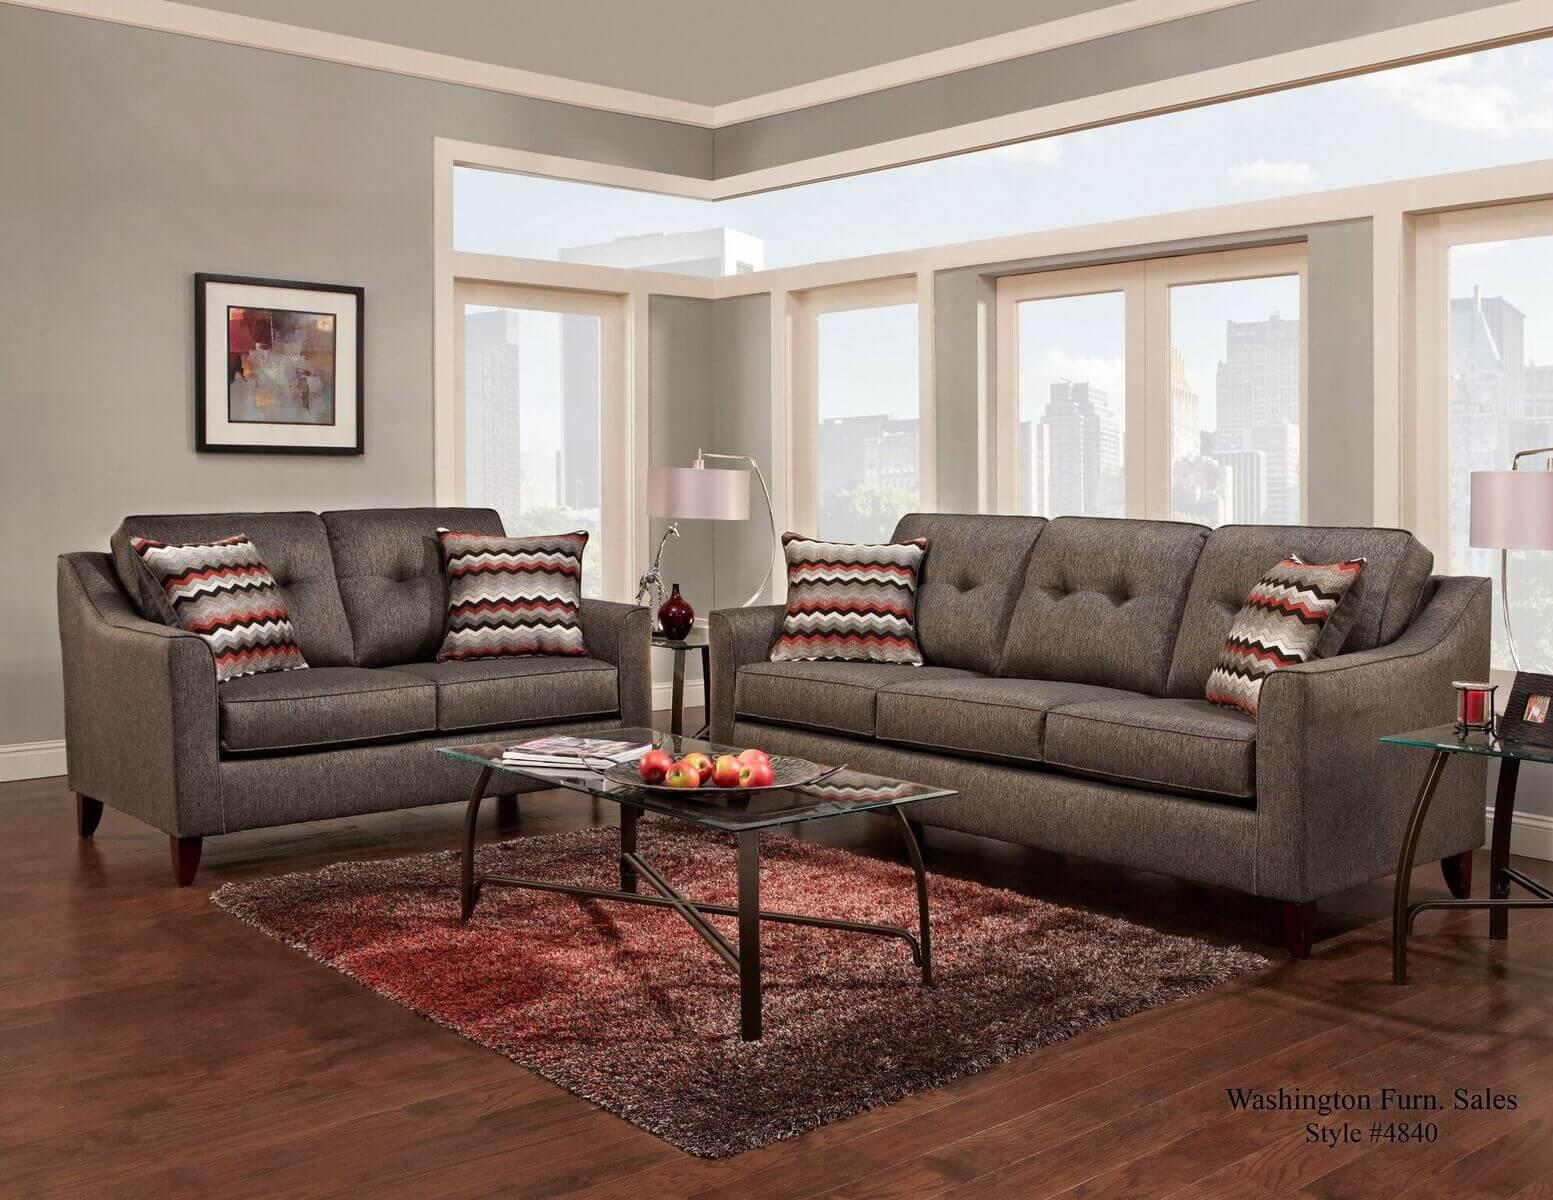 Stoked Ash Sofa And Loveseat By Washington